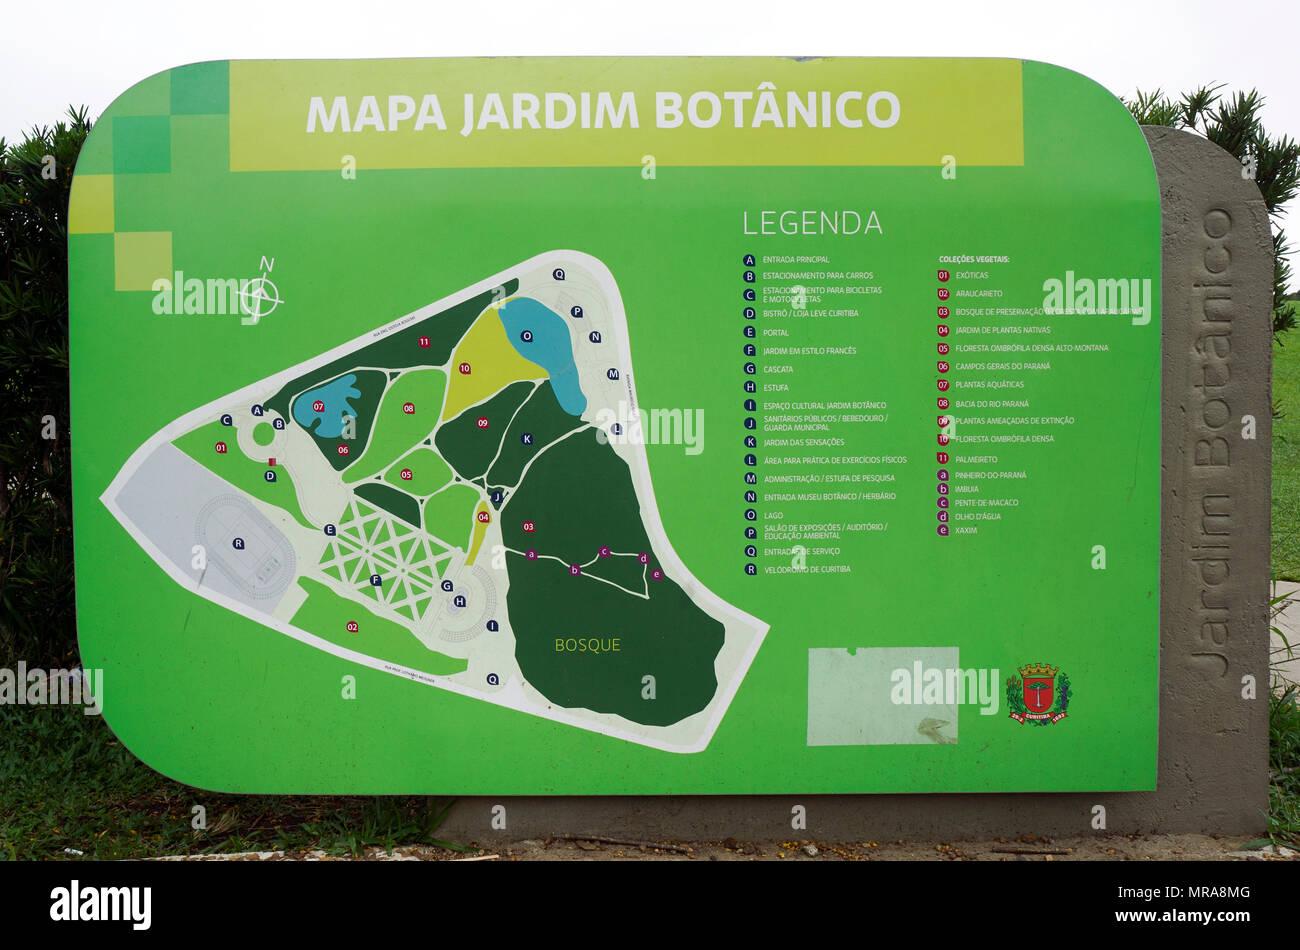 botanical garden map city Curitiba Brazil localization attraction information - Stock Image